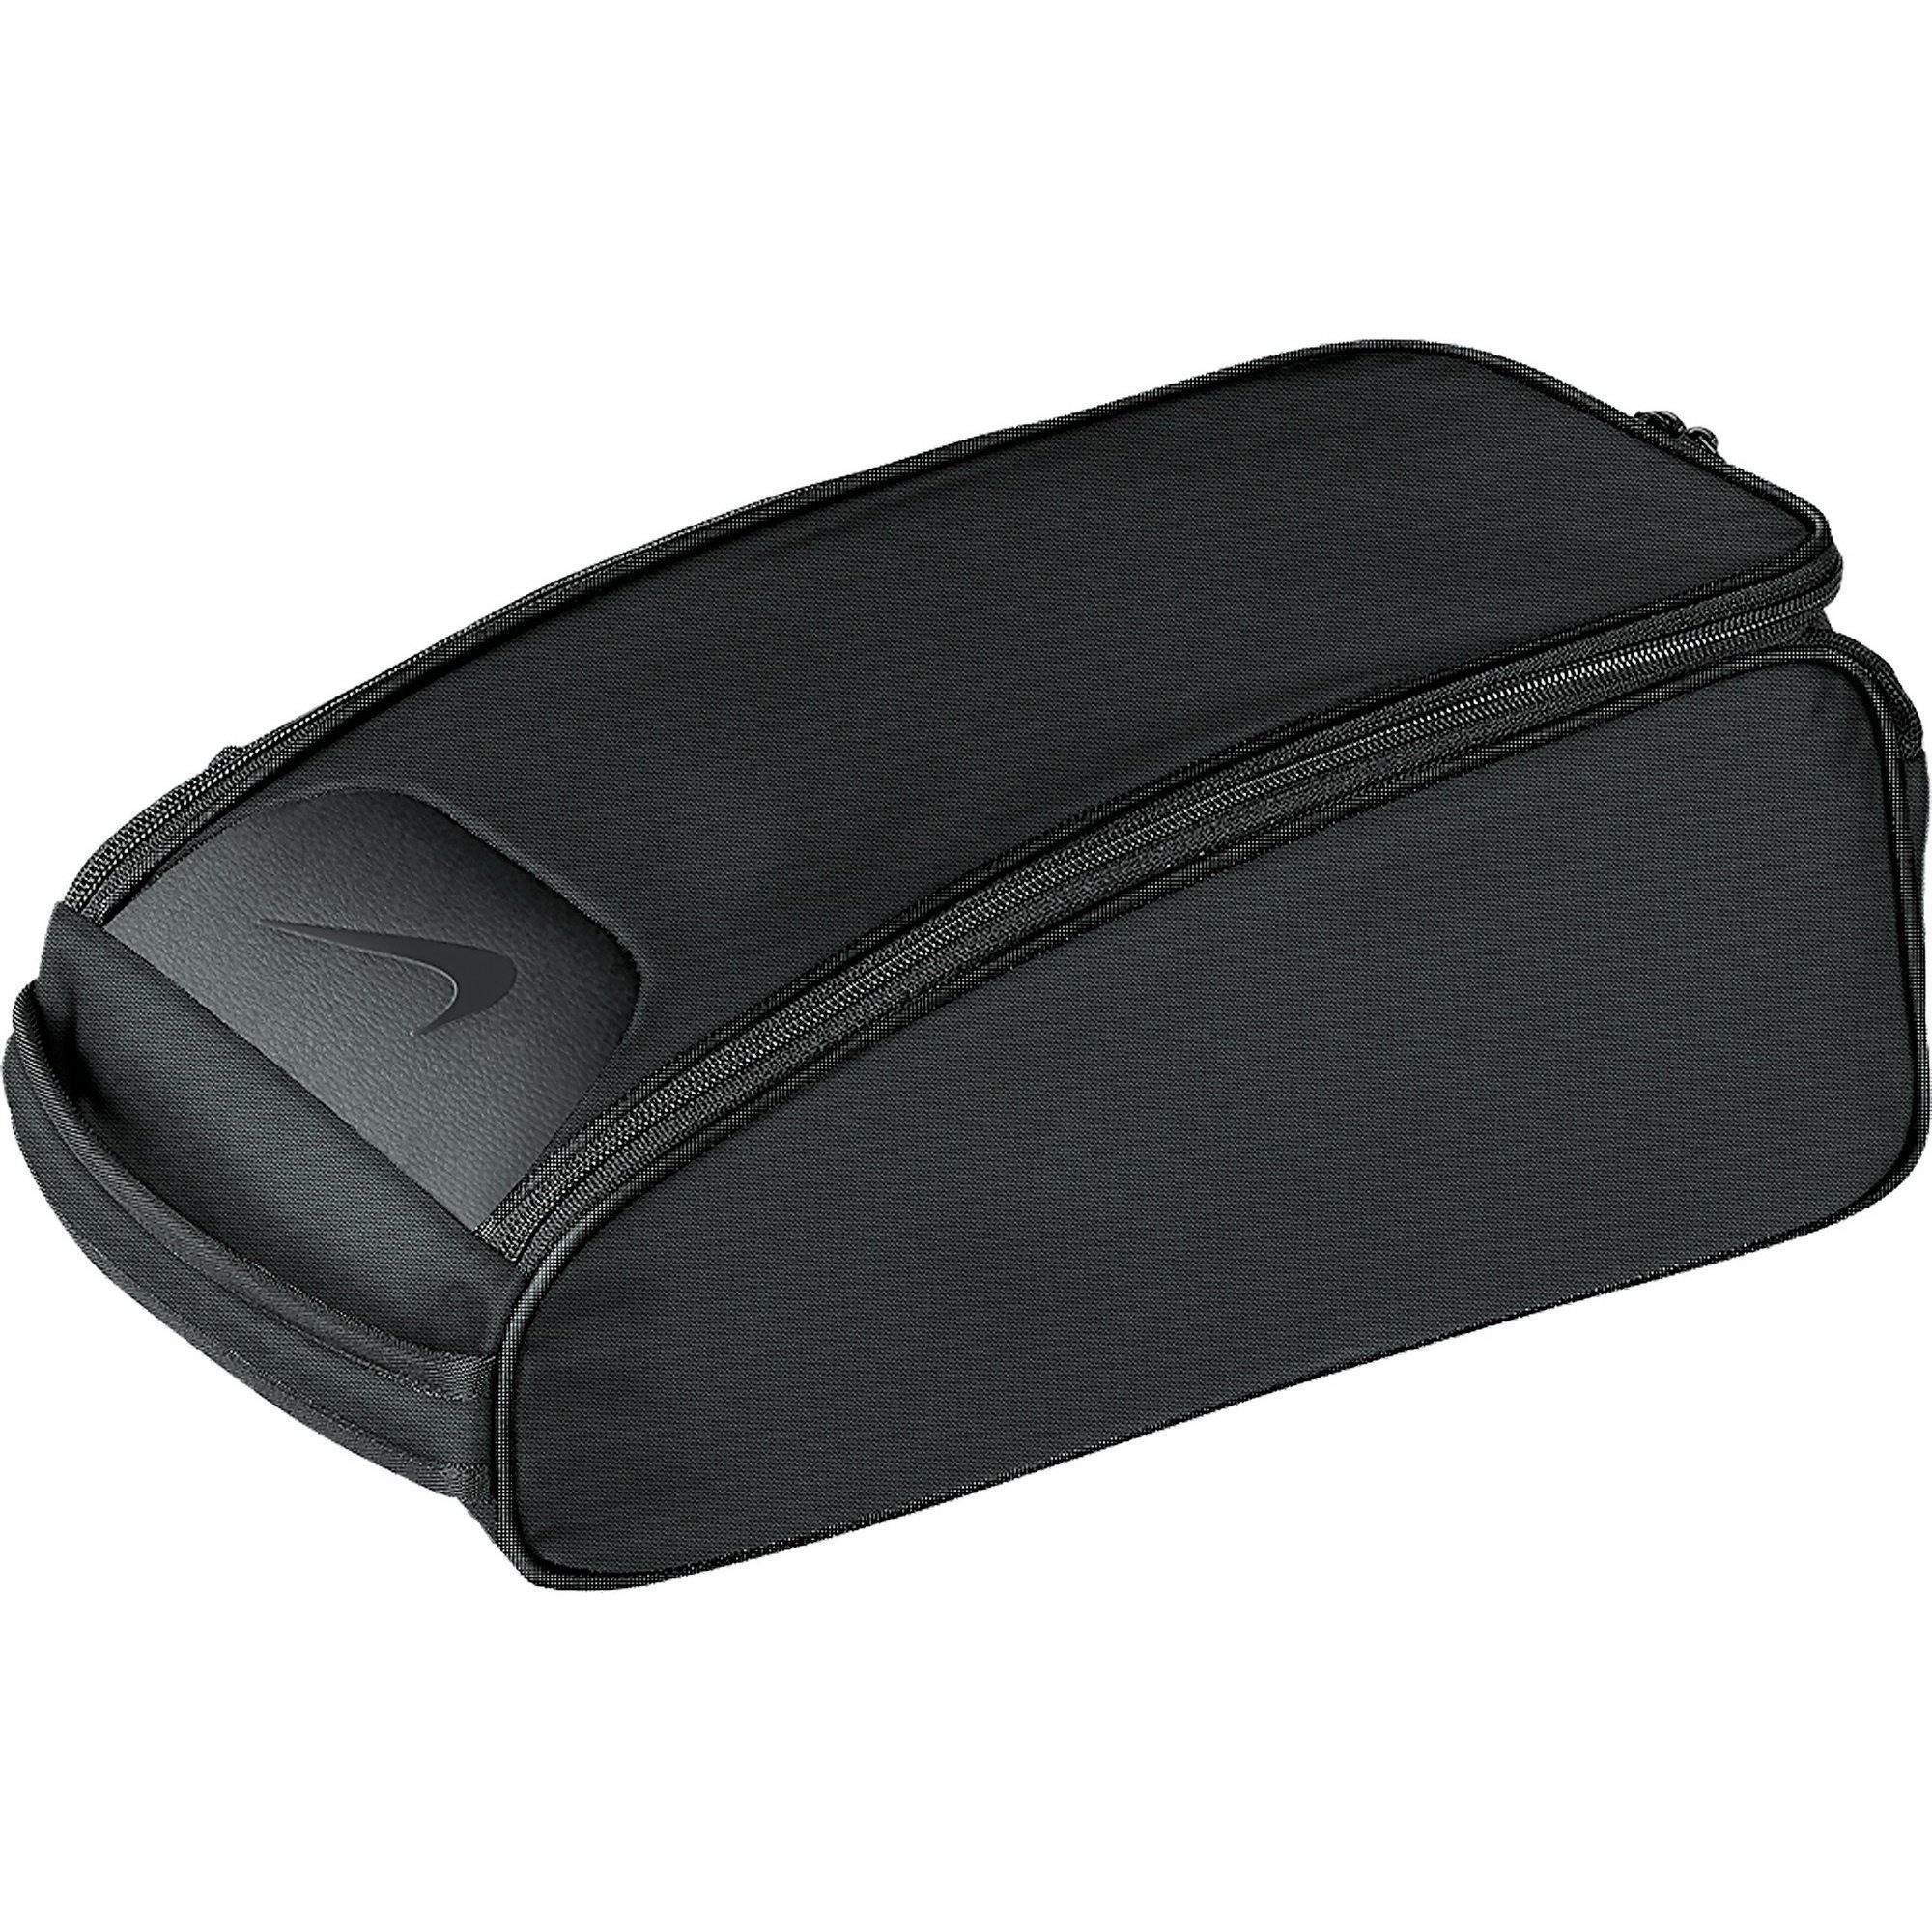 Nike Departure III Shoe Tote Bag (One Size) (Black)